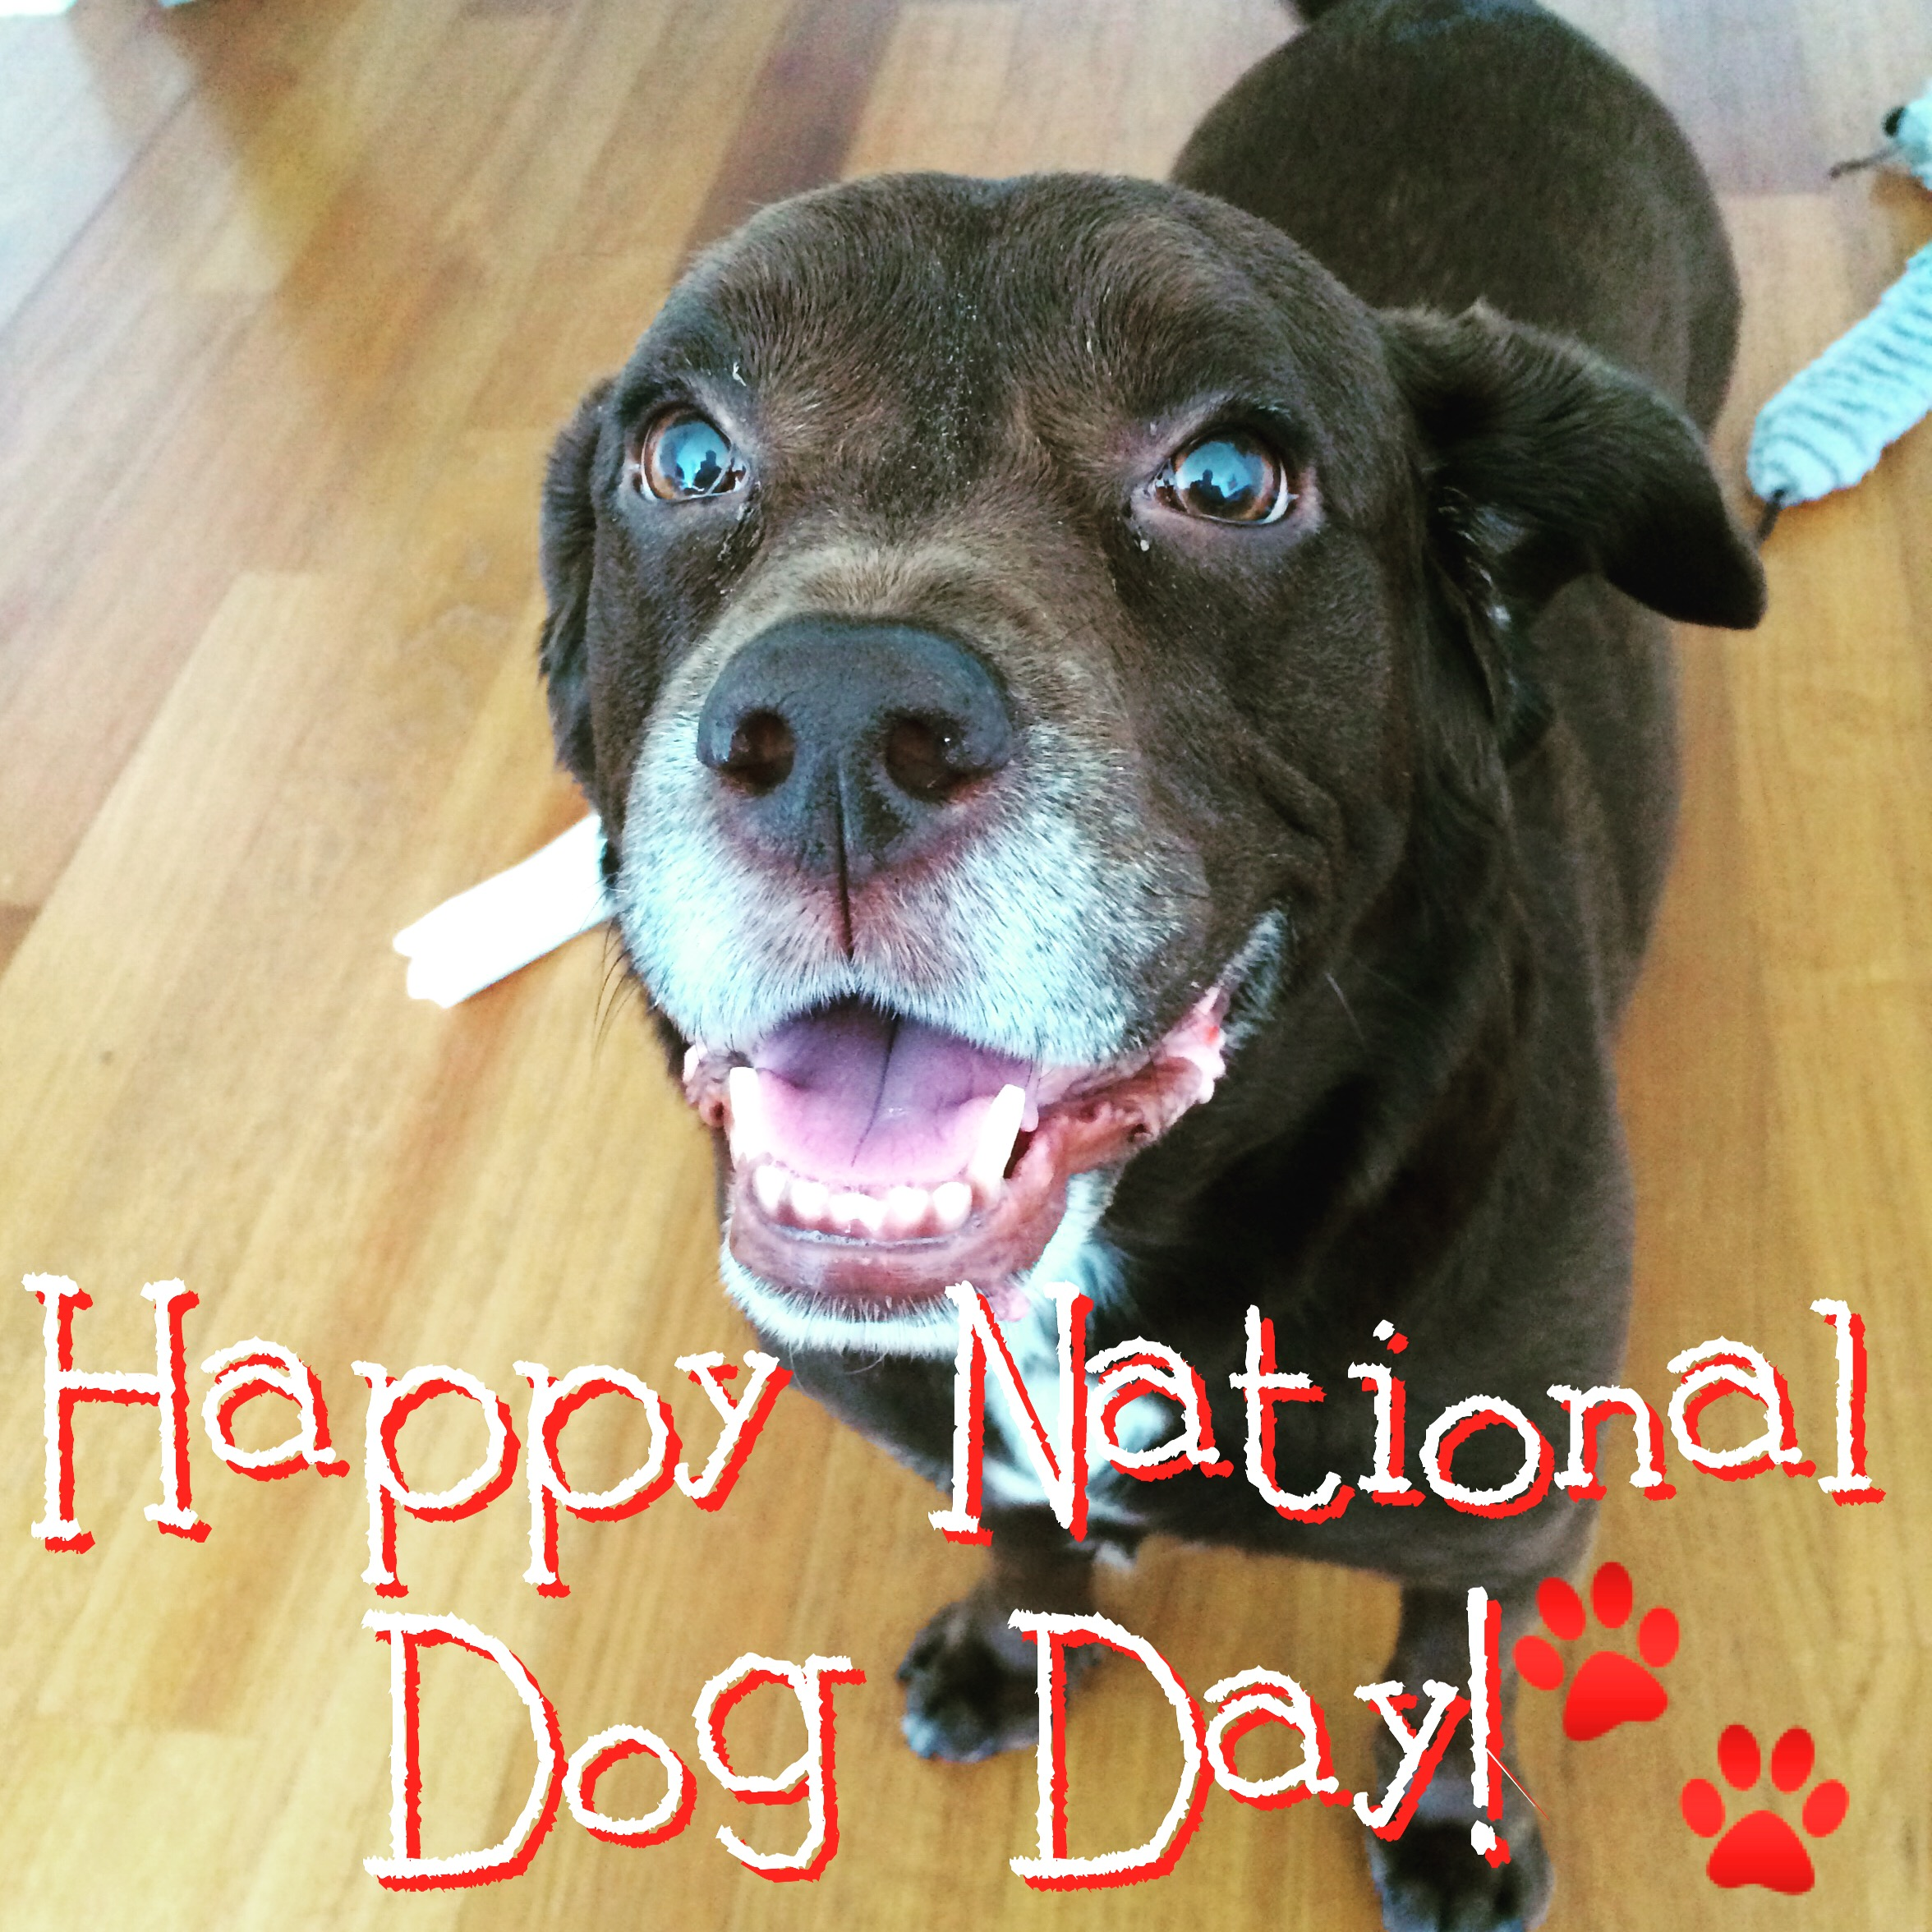 Ripley says Happy National Dog Day!